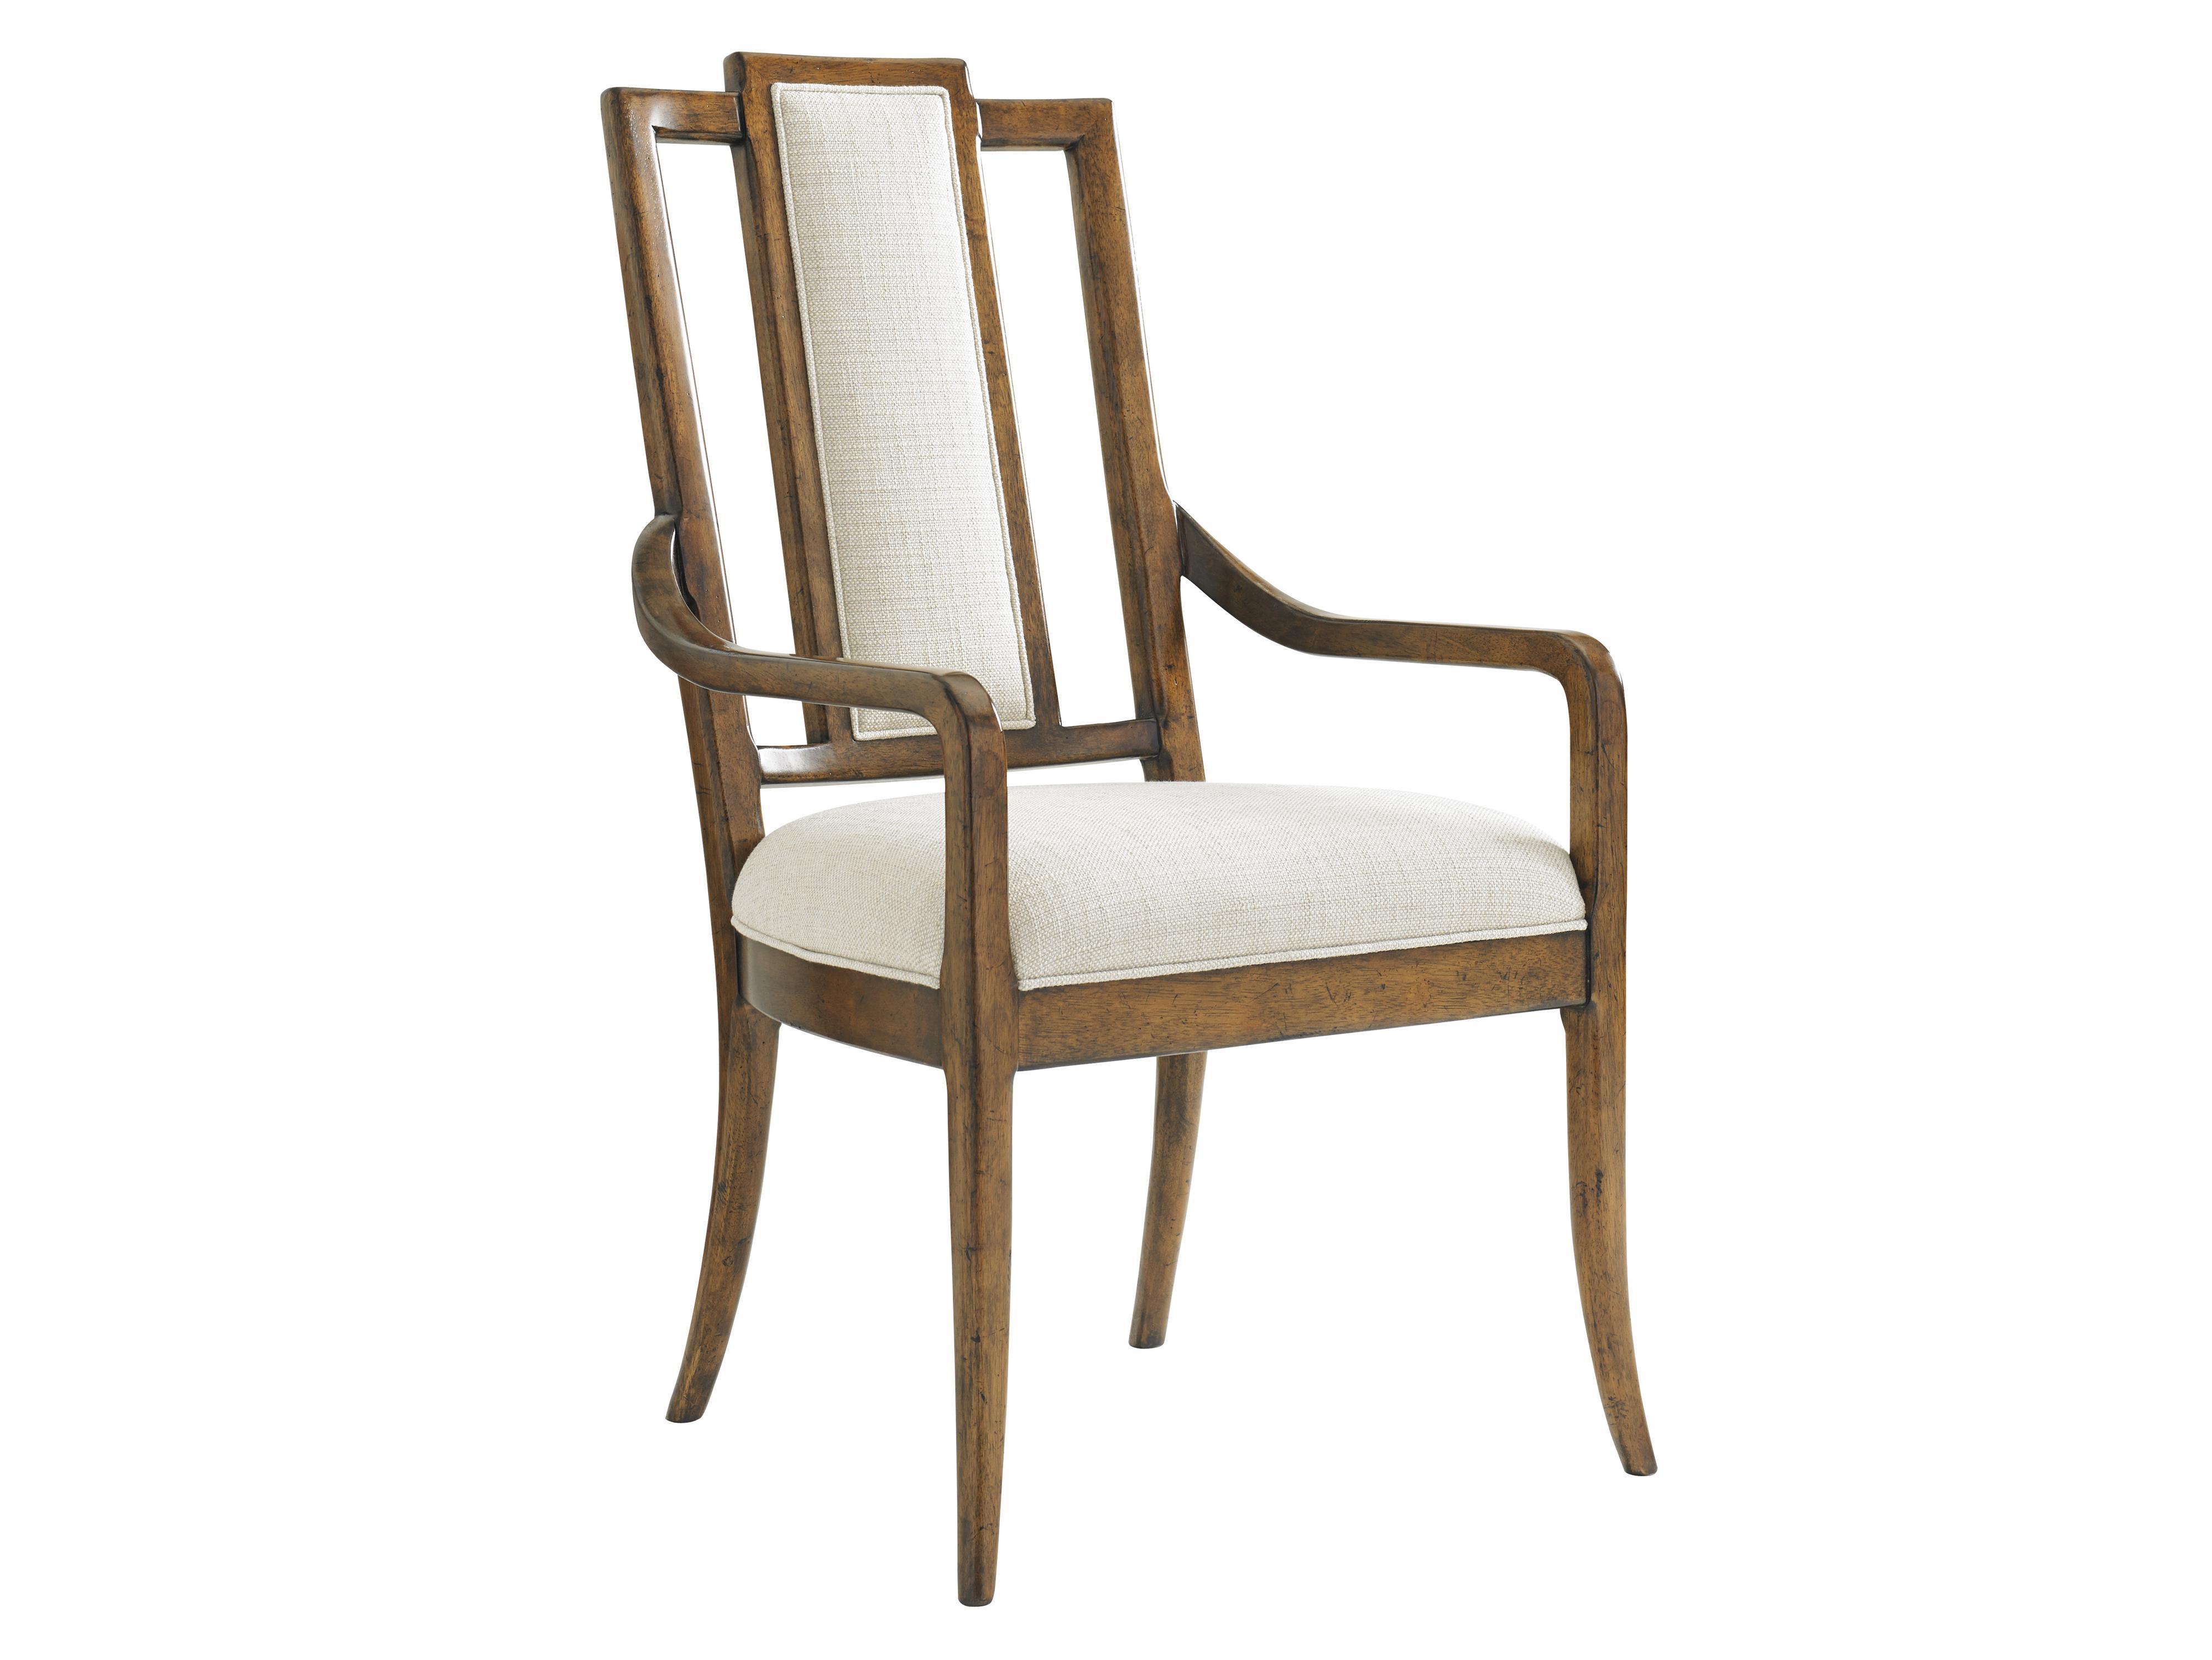 Bali Hai Custom St. Bart's Arm Chair by Tommy Bahama Home at Baer's Furniture